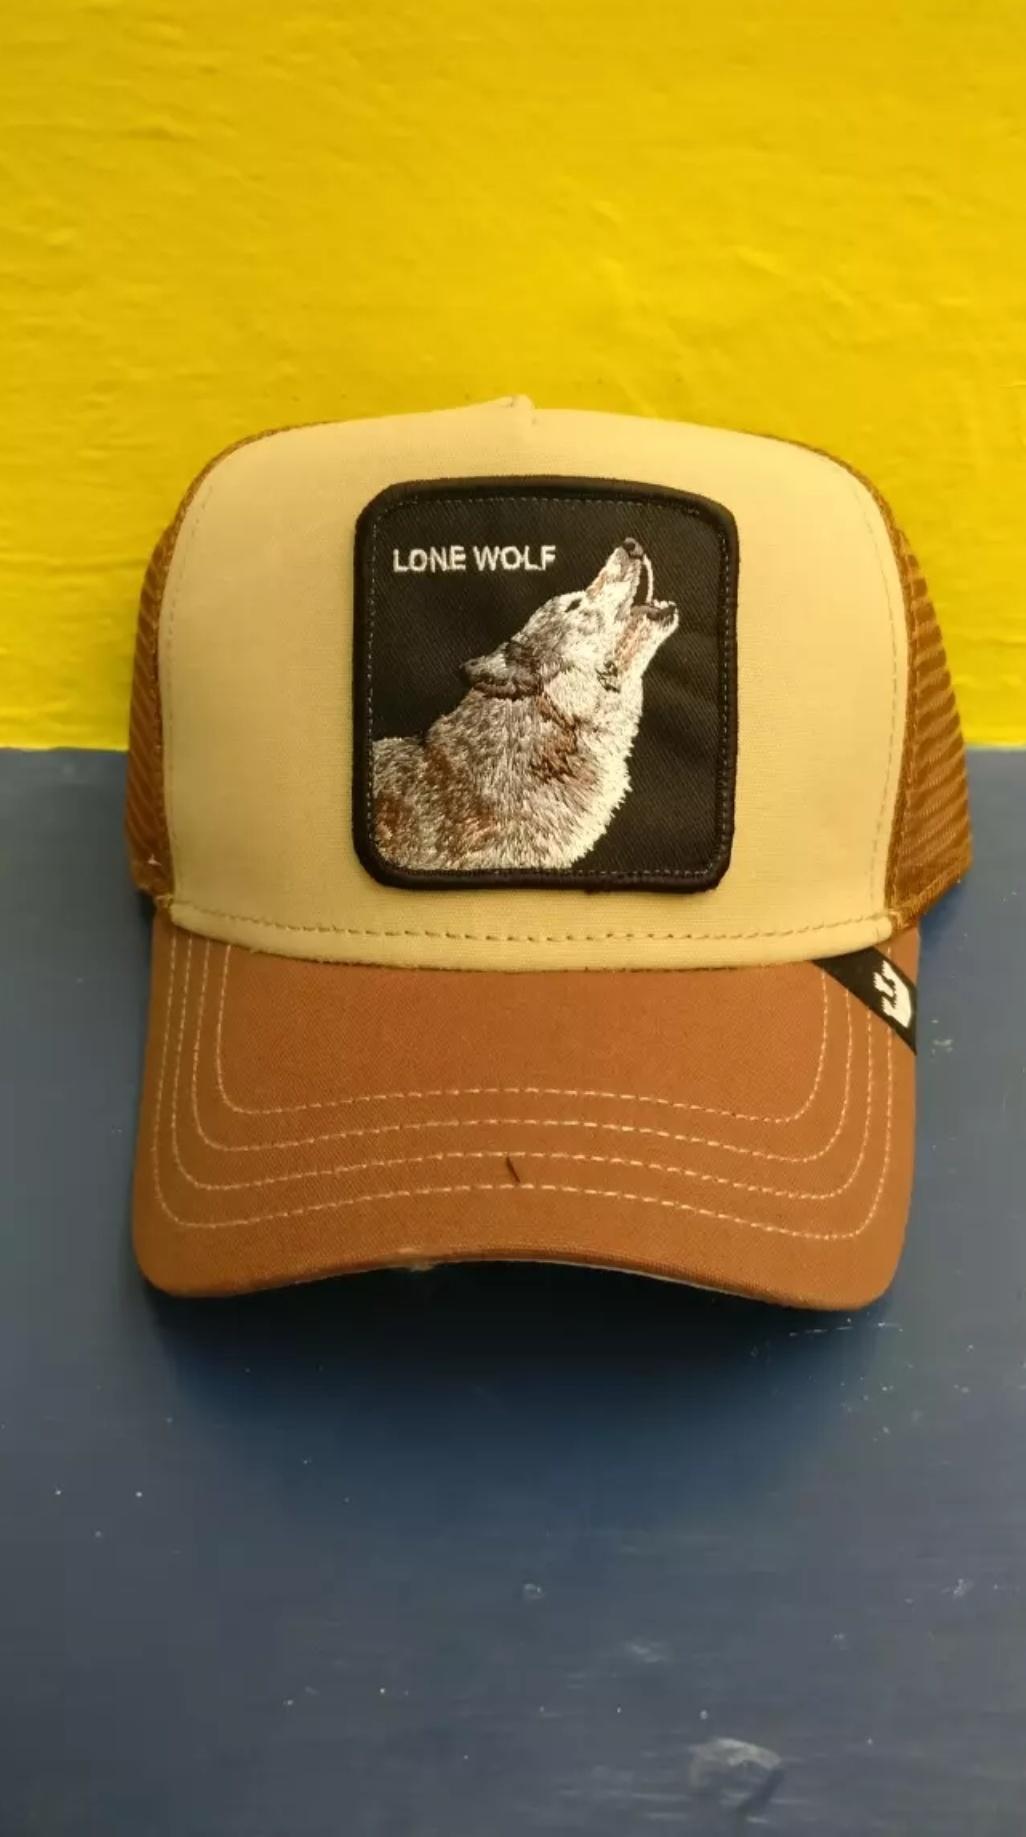 Gorra Goorin Bros lone wolf Animal farm - Sabateries Montse Roig a746a00ef15